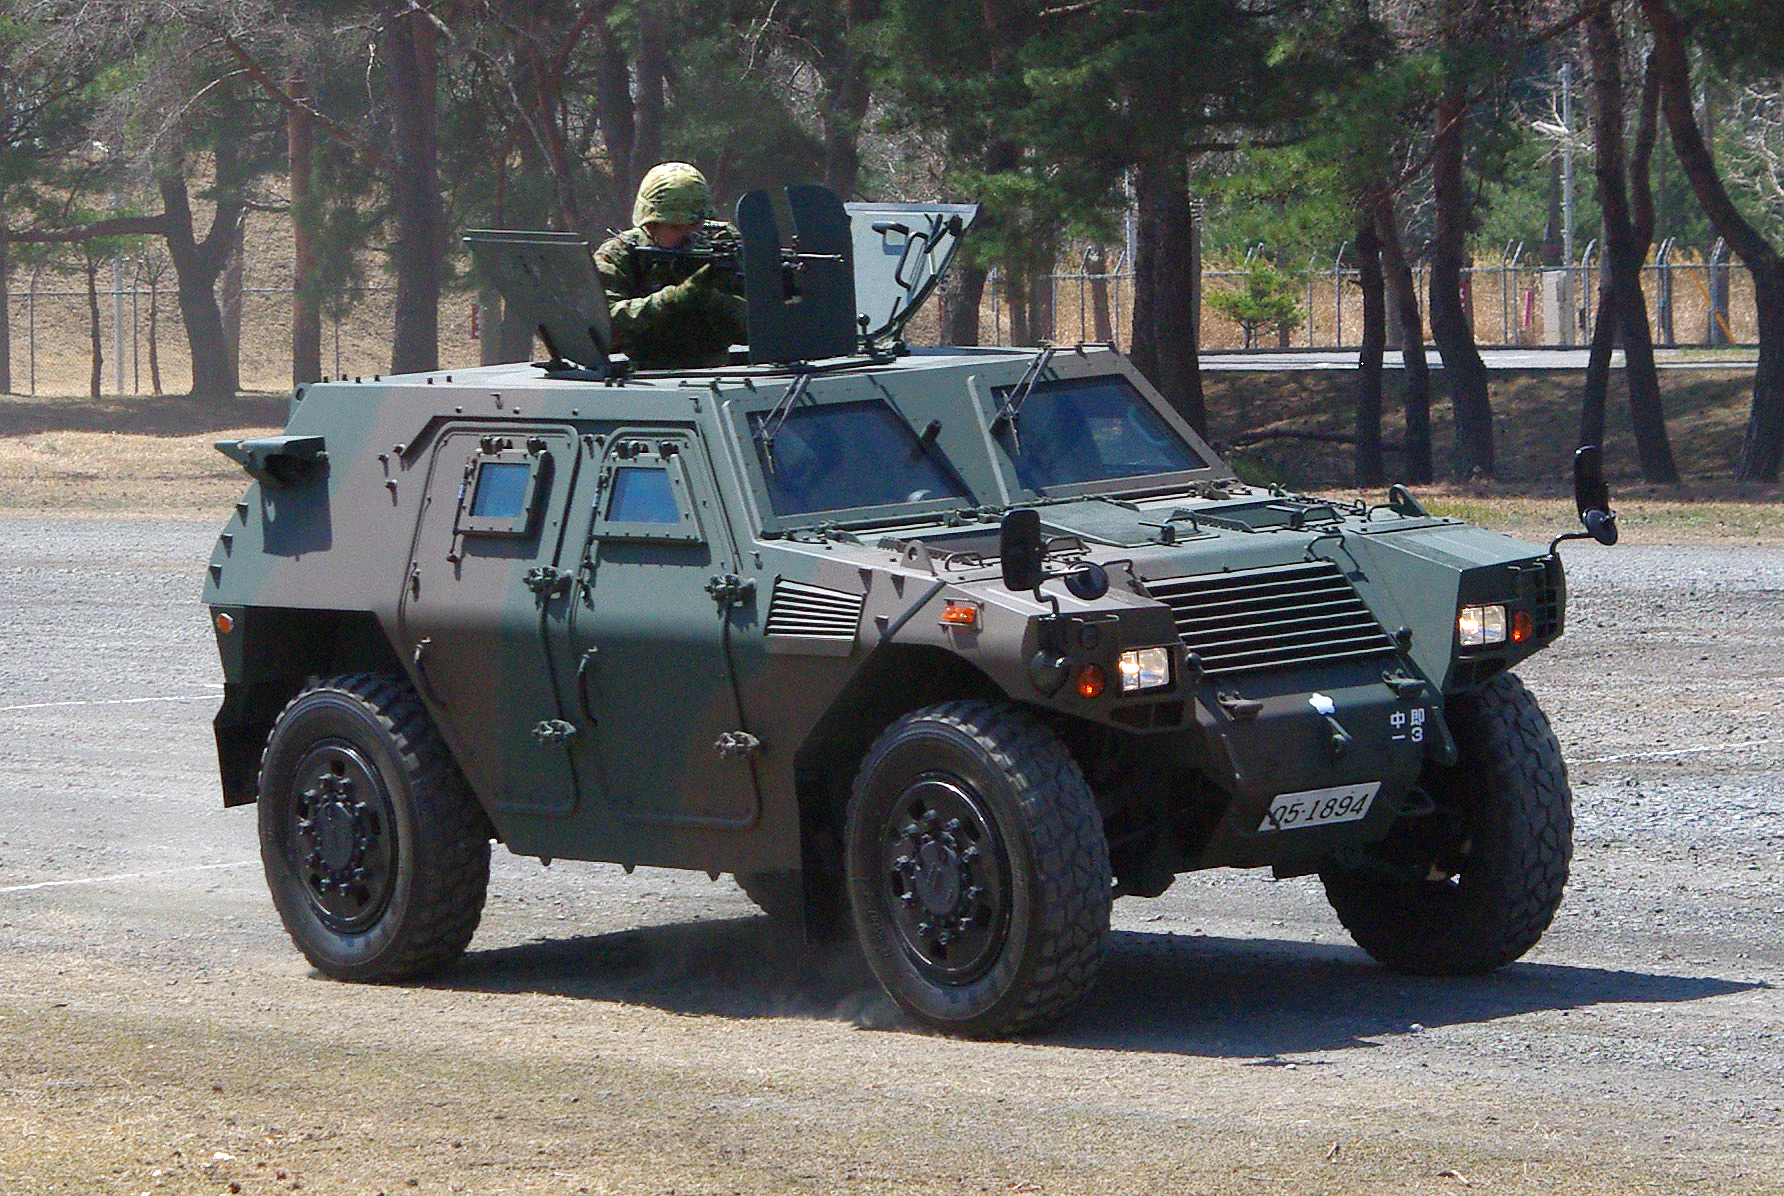 Armored Vehicles For Sale >> File:JGSDF Light Armored vehicle 20120408-03.JPG ...